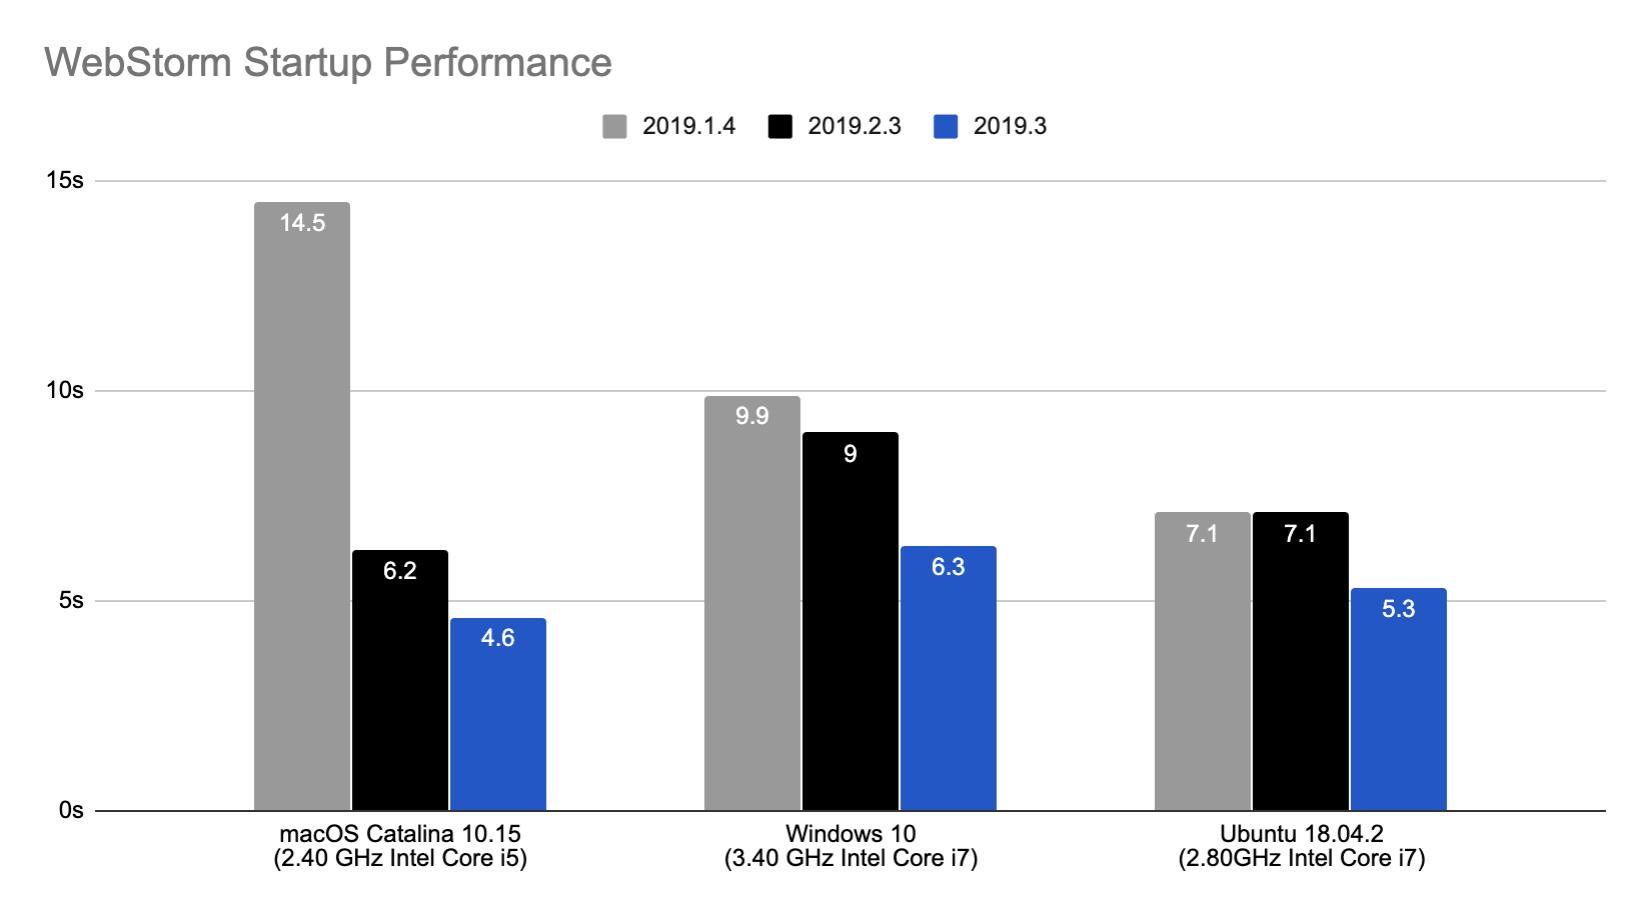 webstorm-startup-performance-chart